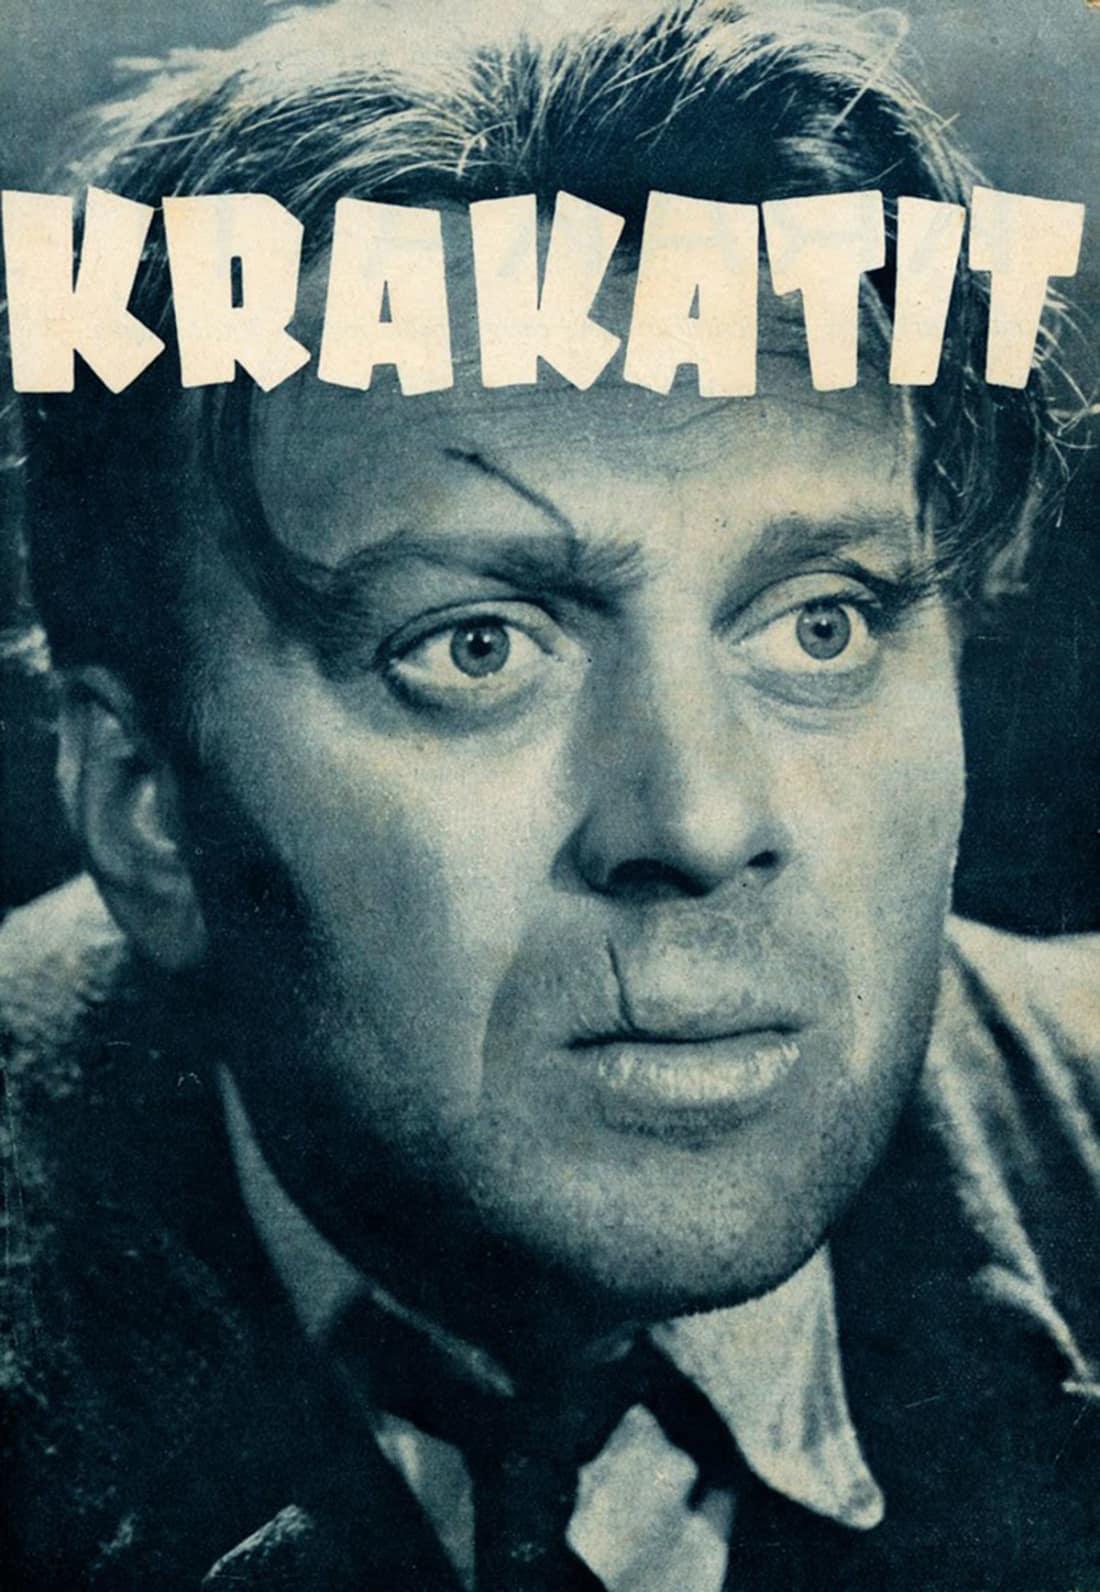 The best Soviet science fiction movie. Fourth round 1